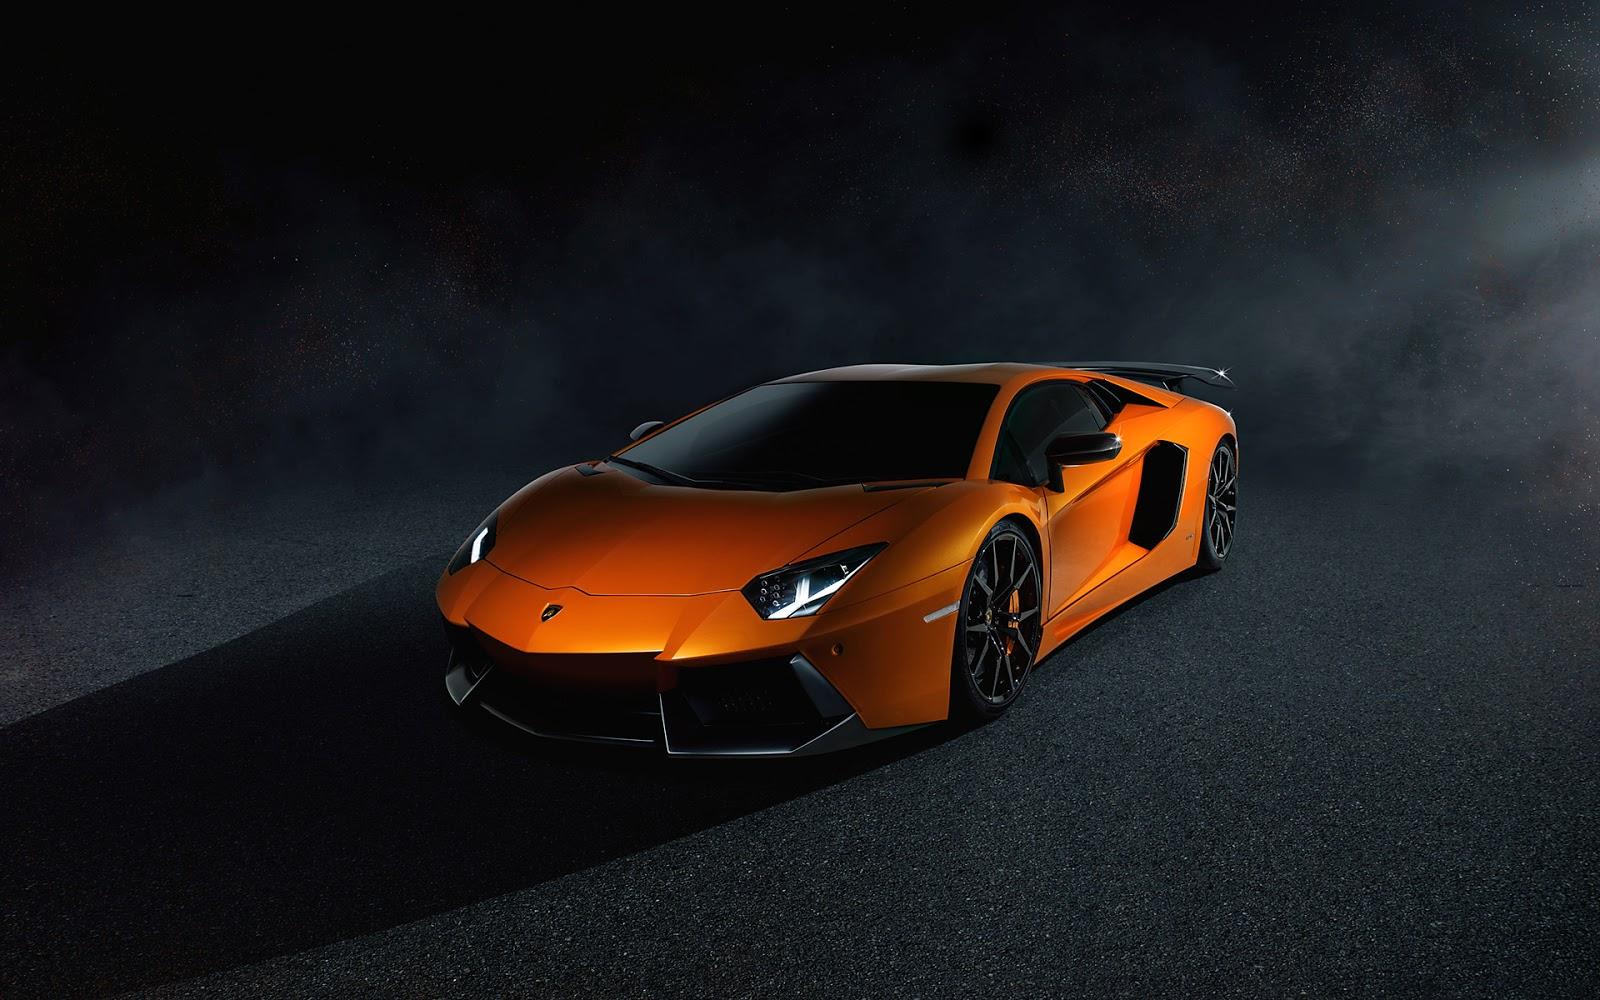 Good   Wallpaper Home Screen Sport - lamborghini_aventador_lp700_4_orange-wide  Trends_276894.jpg